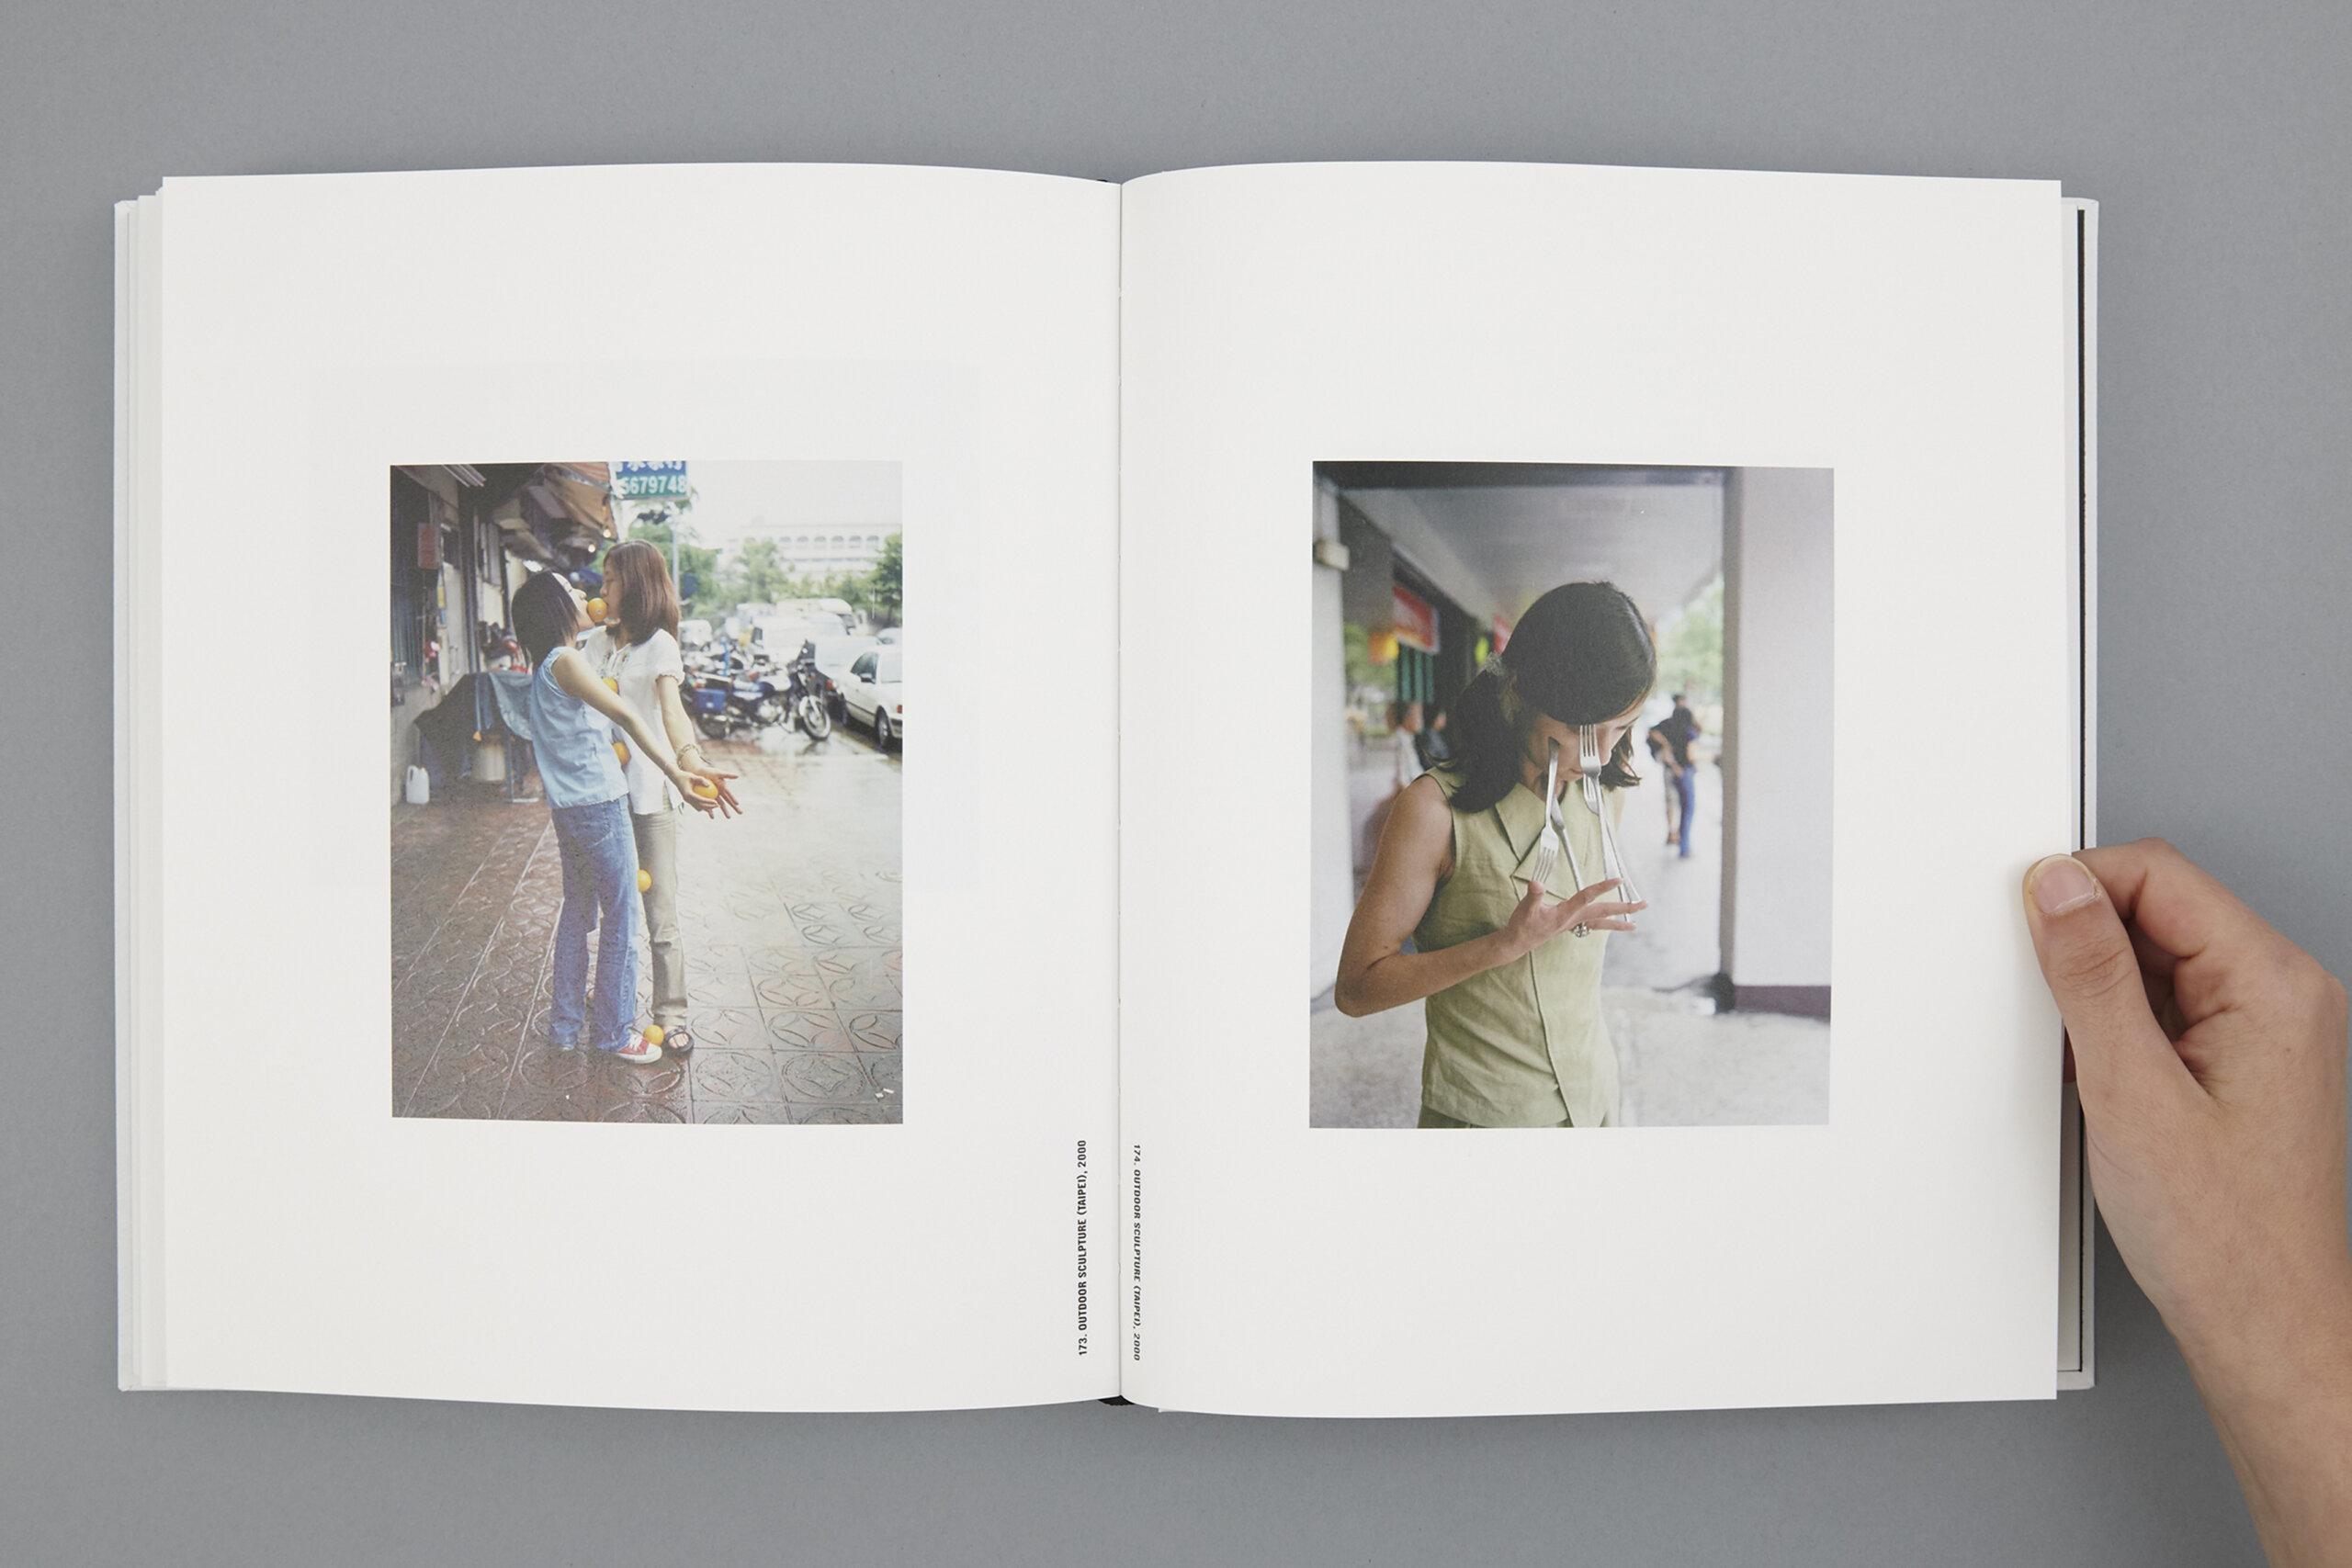 wurm-photographs-delpire-co-5